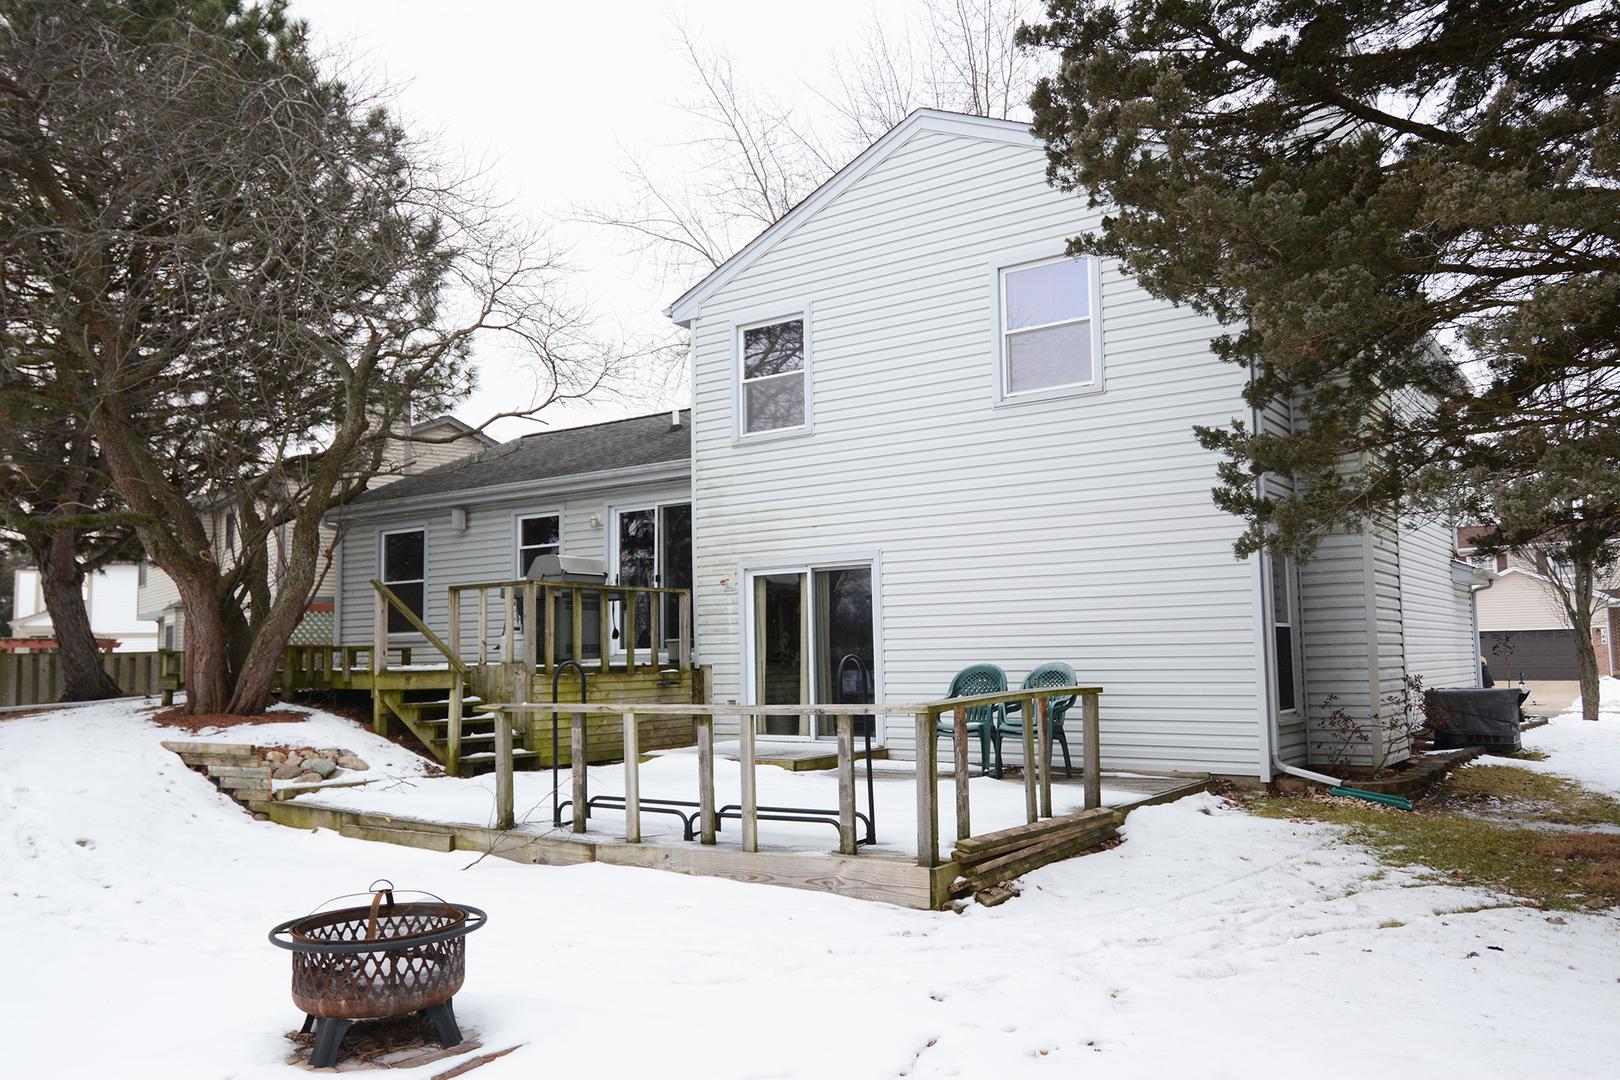 361 Shelburne, Carol Stream, Illinois, 60188